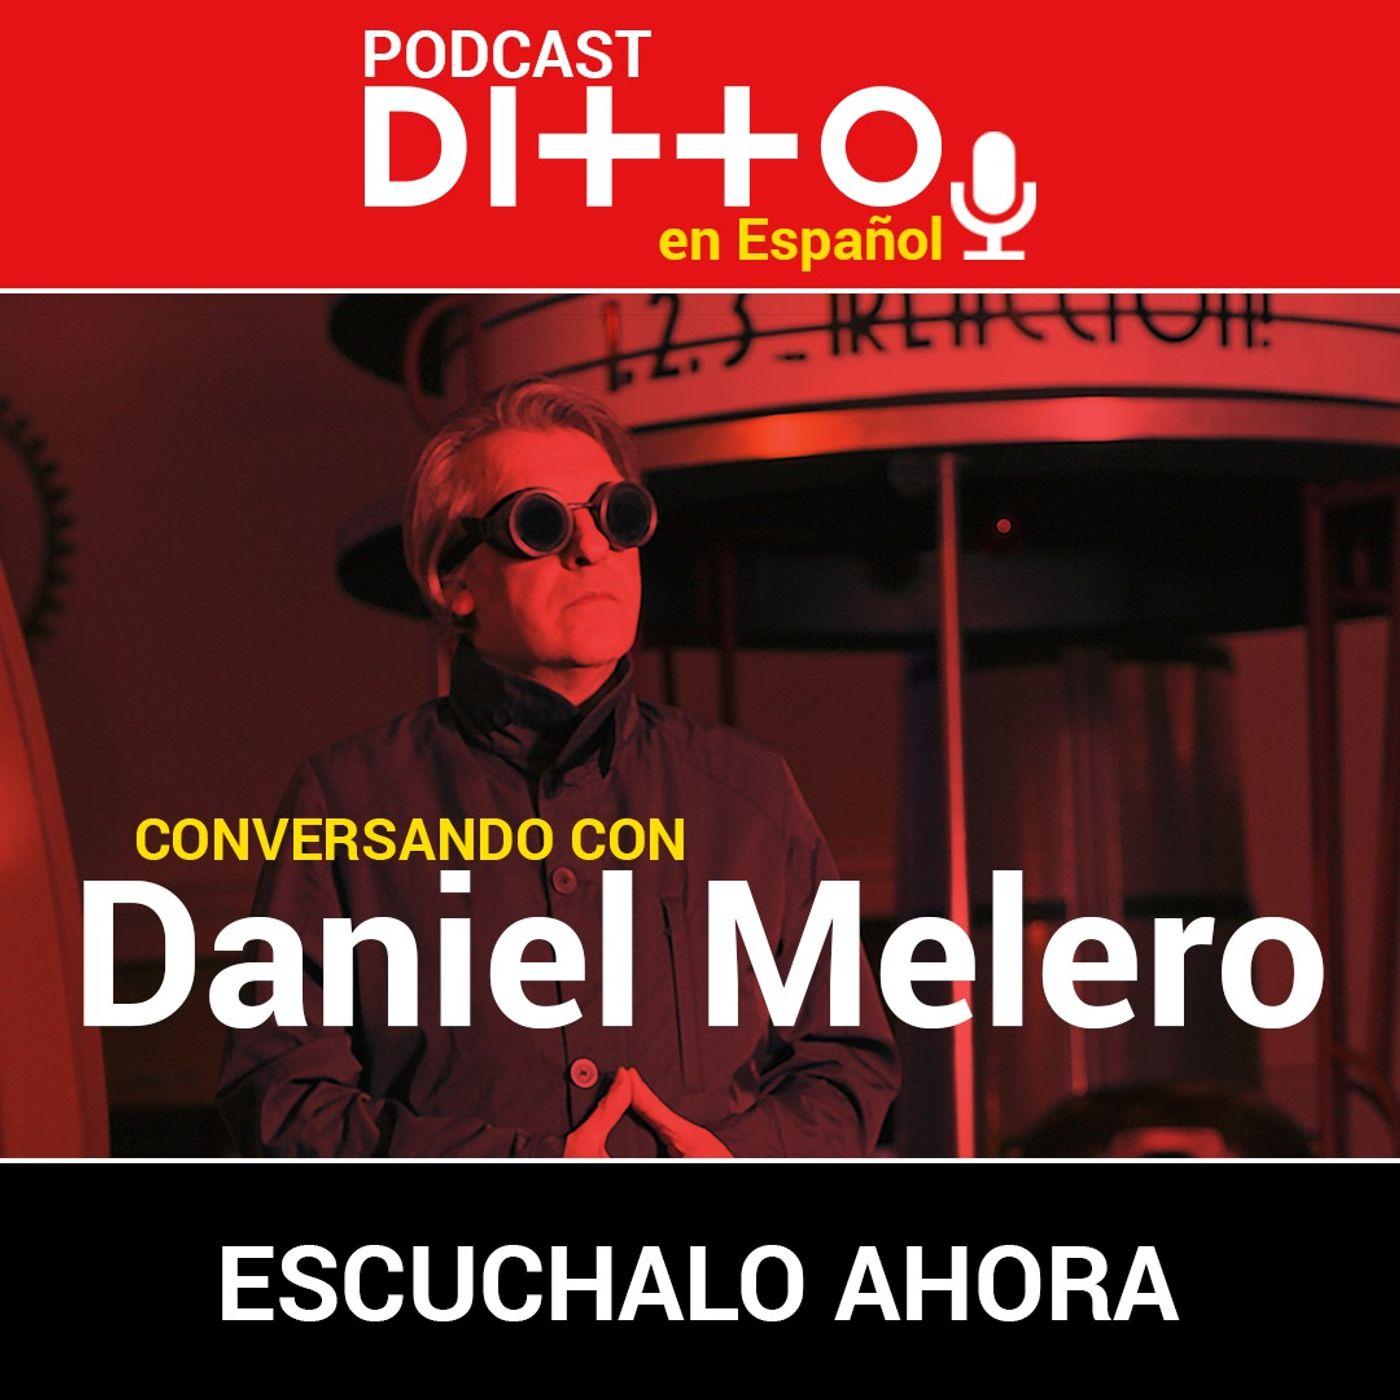 Conversando con Daniel Melero